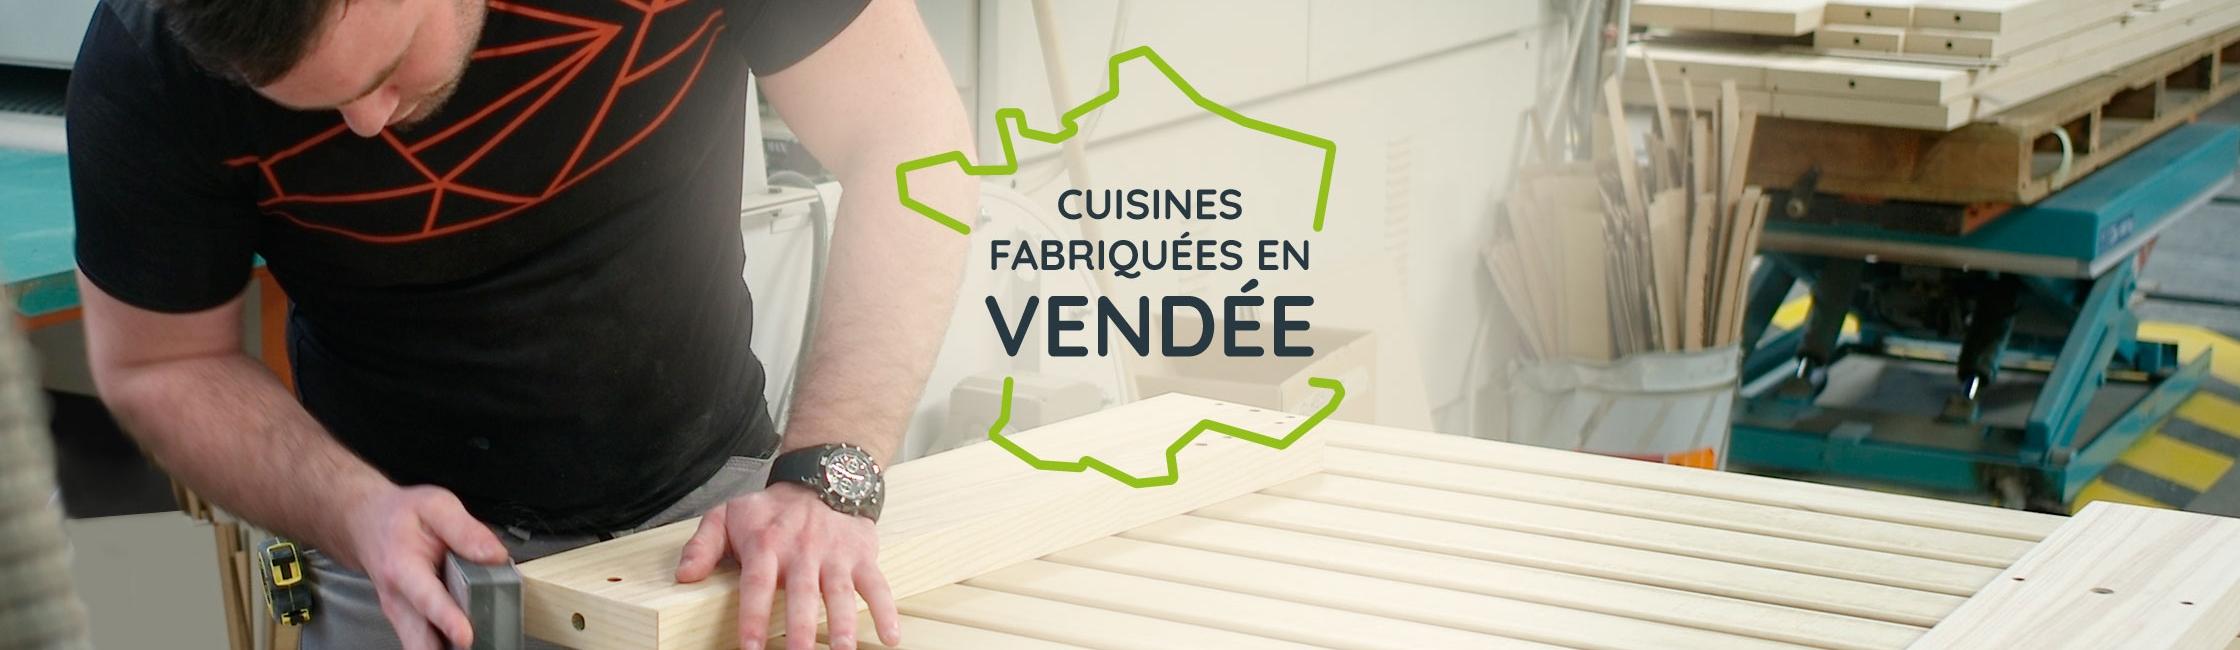 fabrication française - comera cuisines - Cuisine Fabrication Francaise